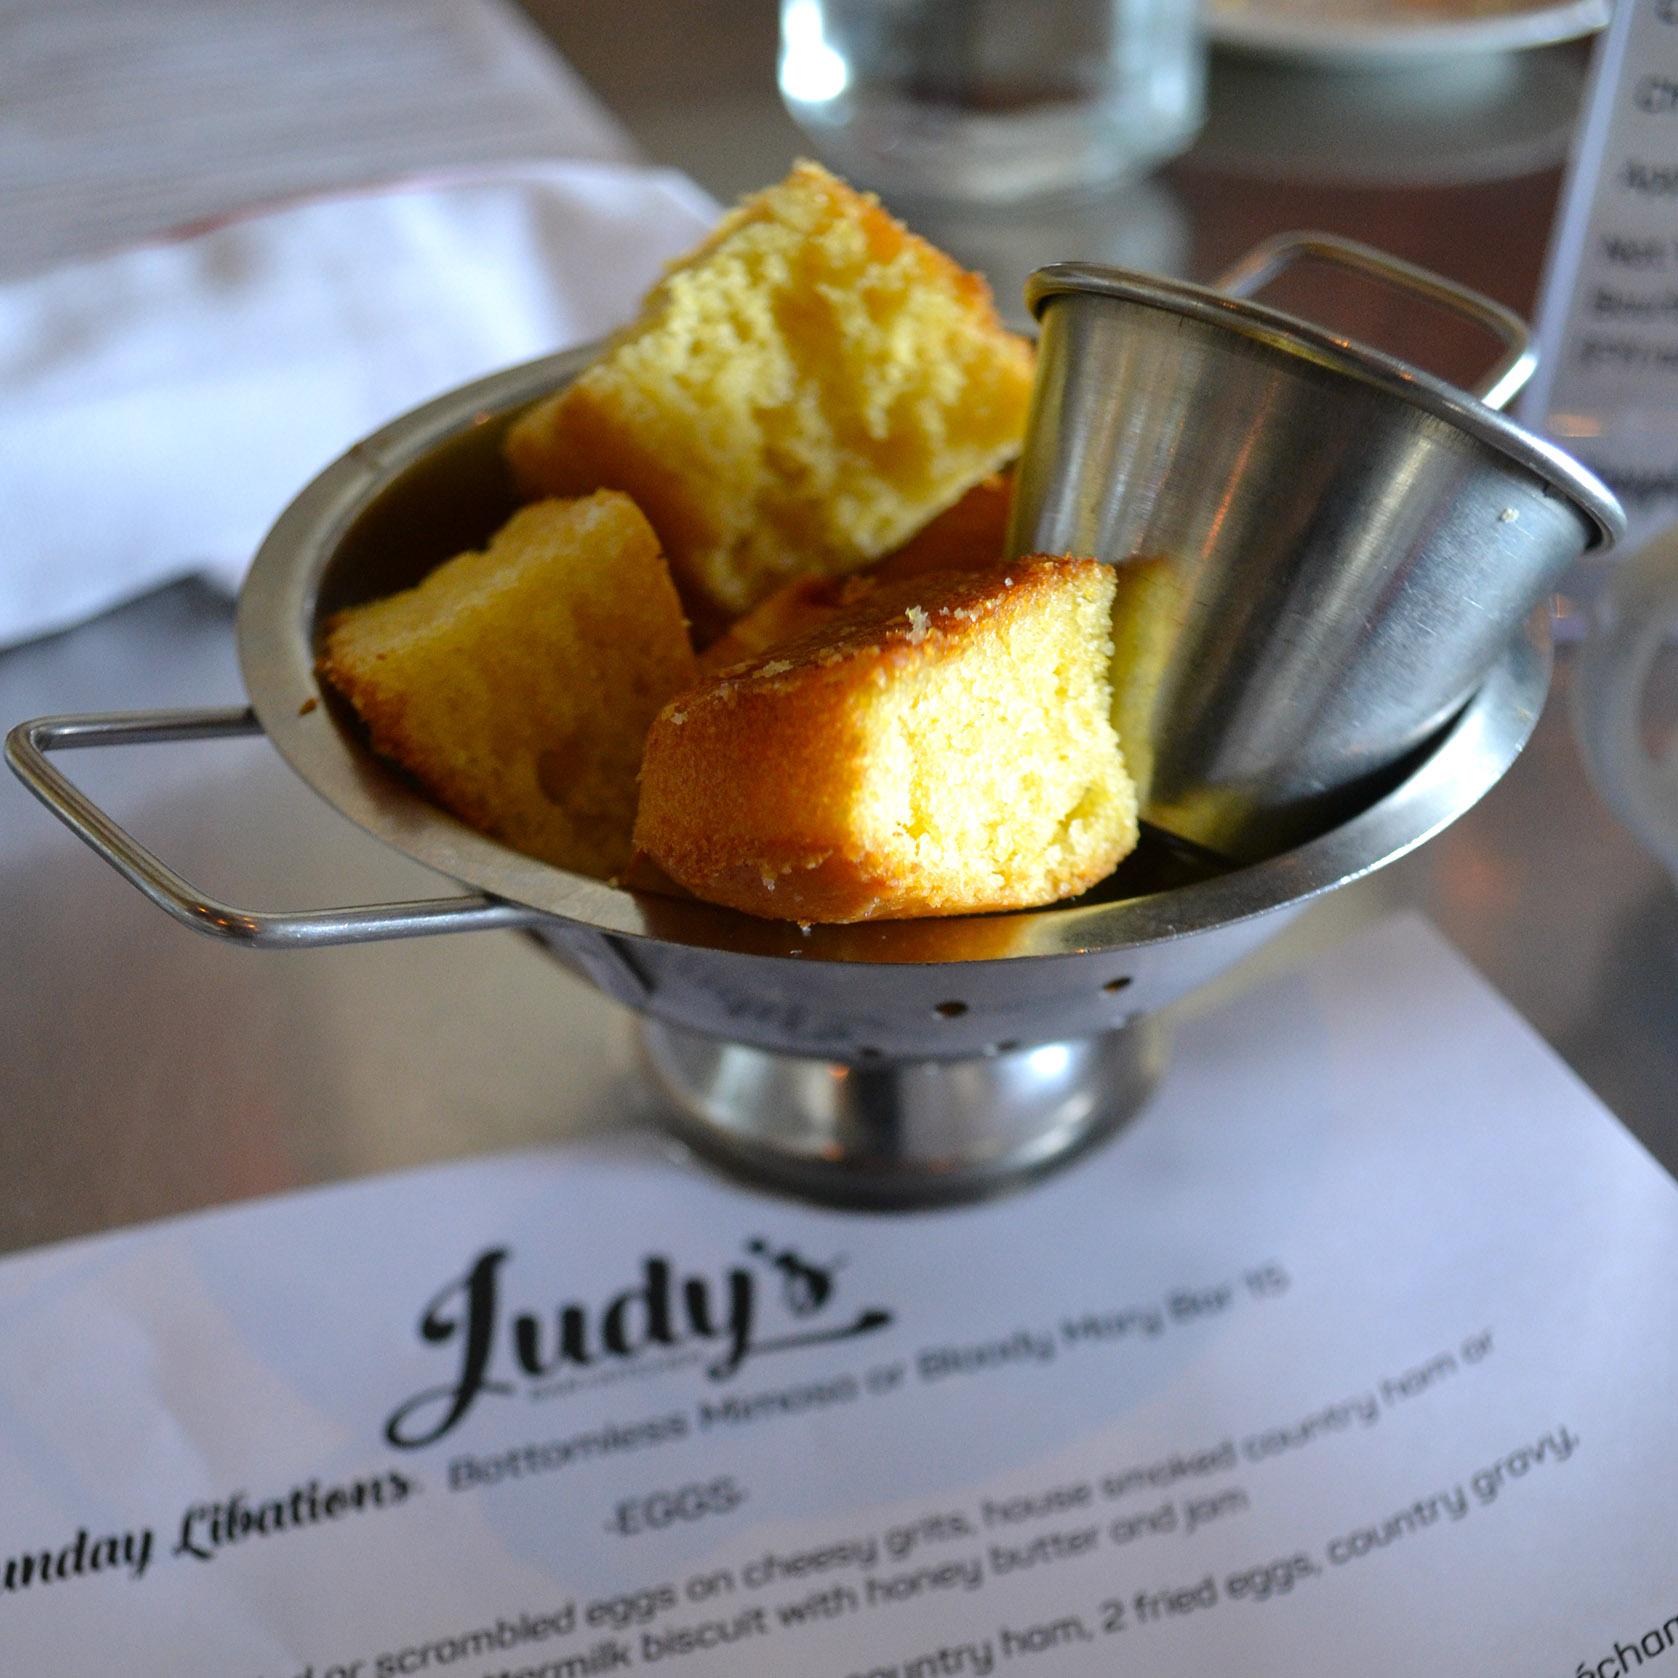 judys bar and kitchen stamford